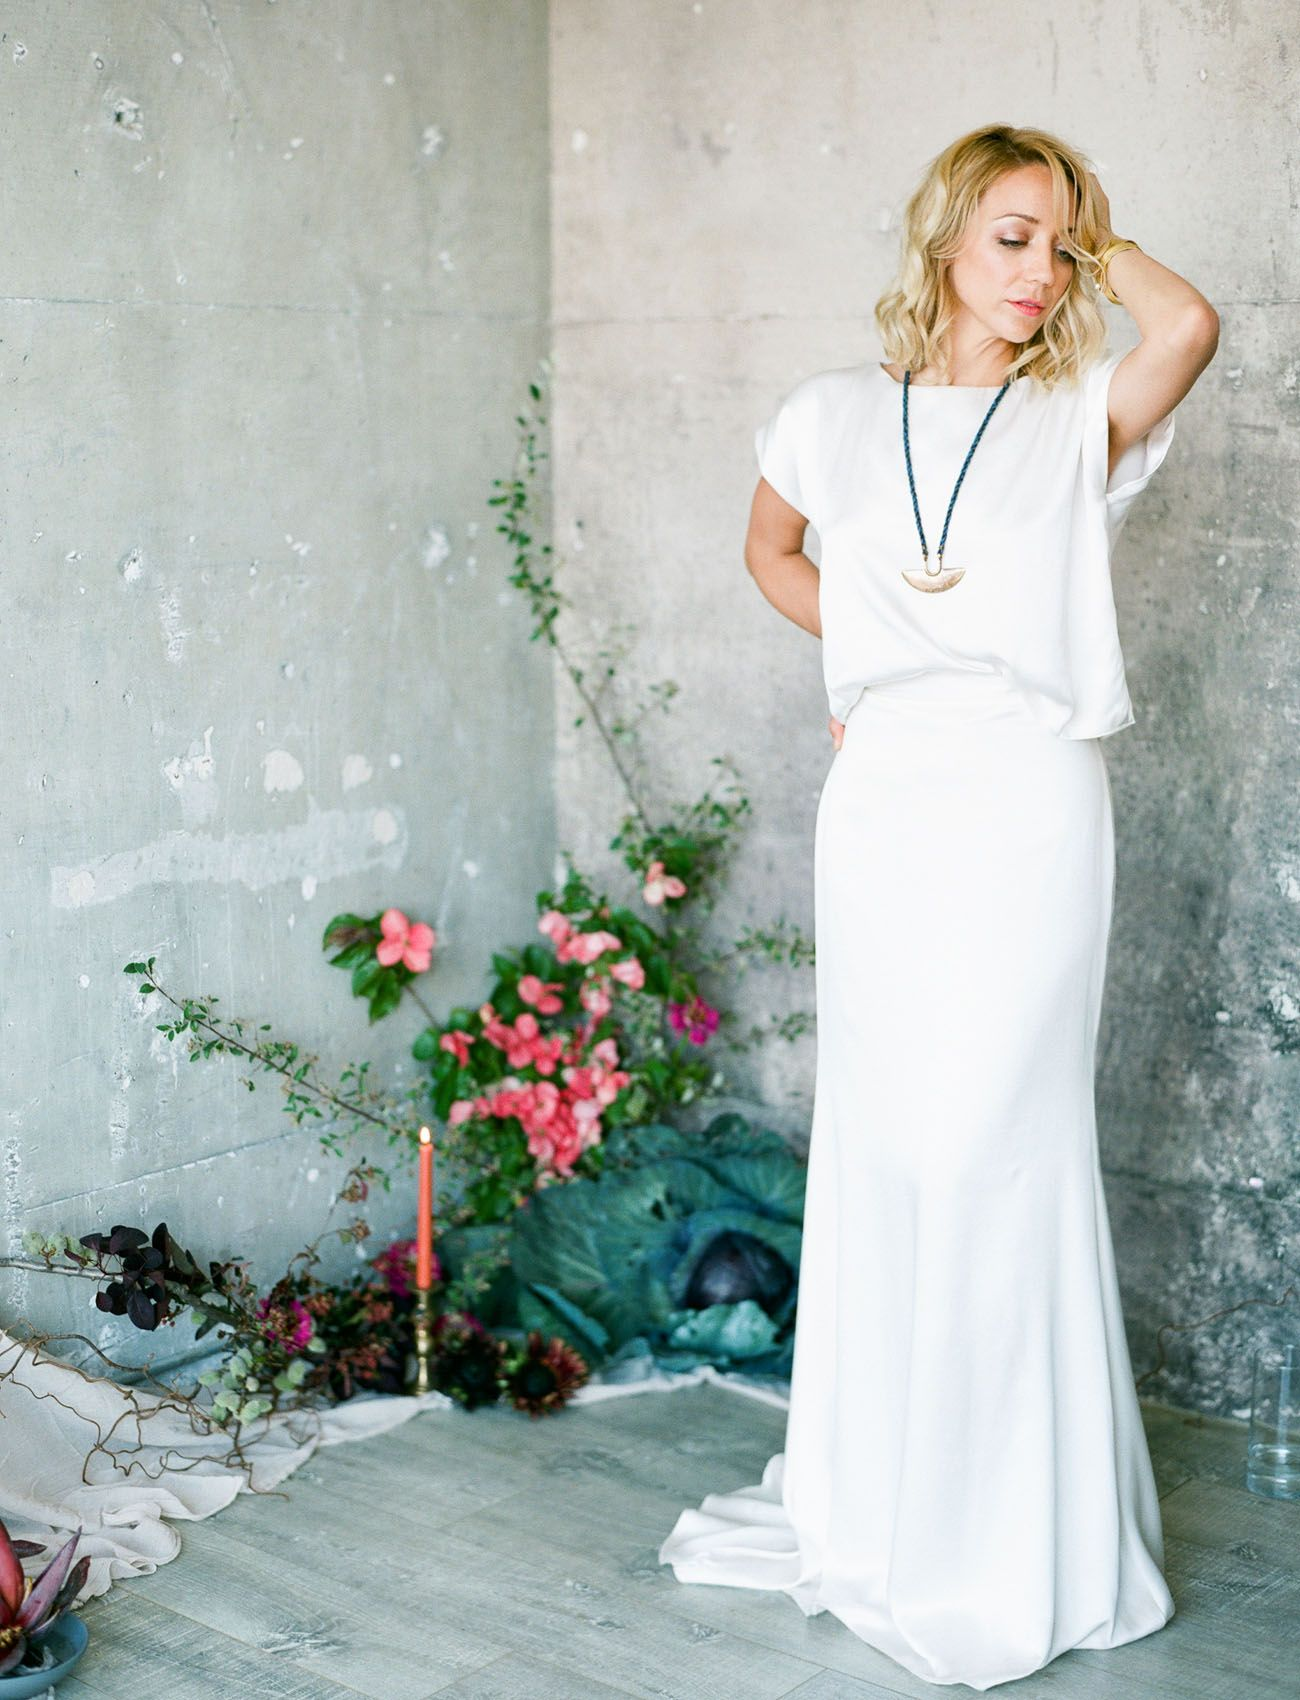 Magnificent Jewish Wedding Gowns Vignette - All Wedding Dresses ...